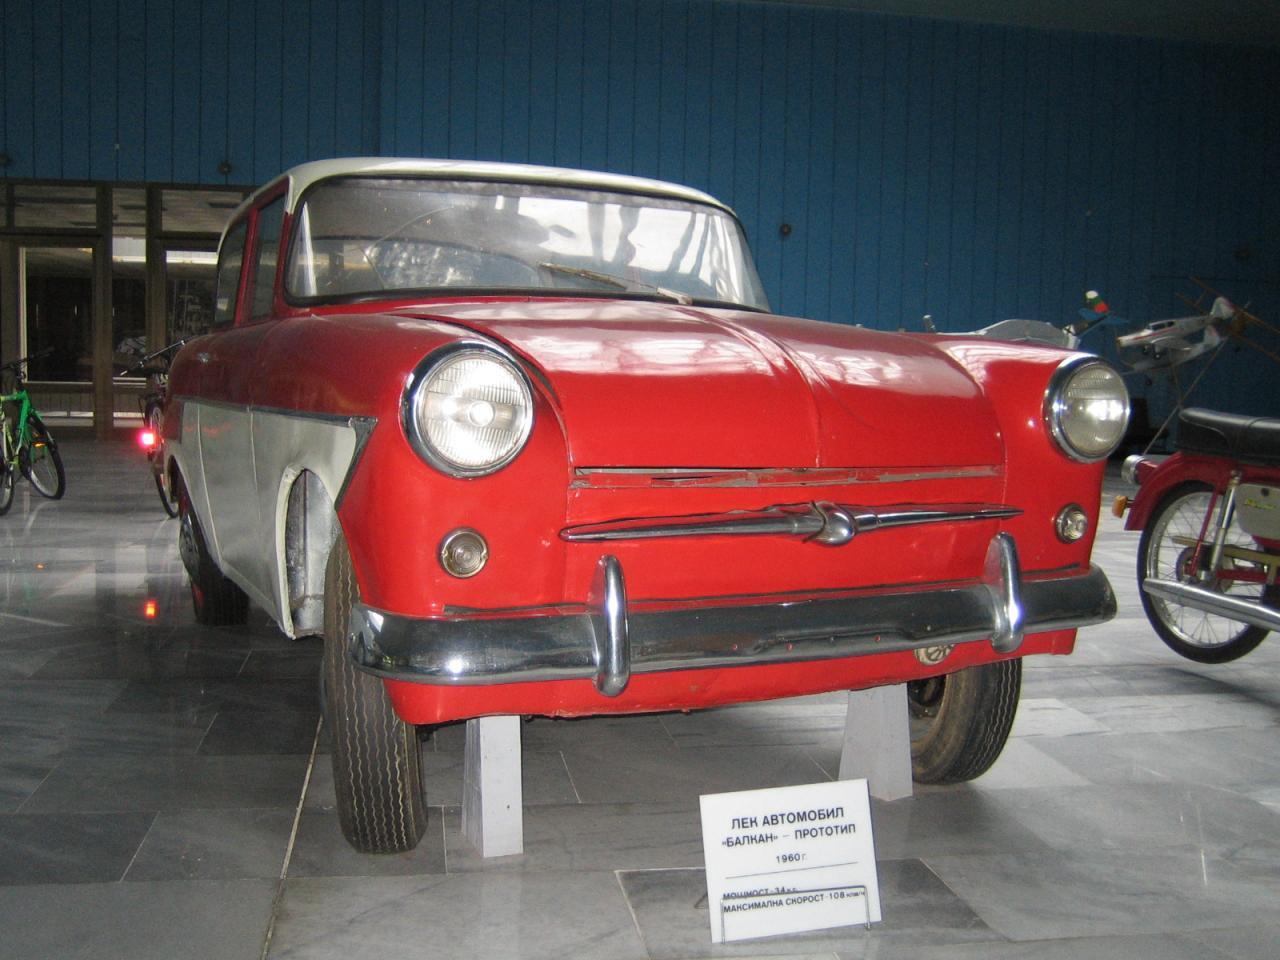 Balkan 1200 – the first Bulgarian car